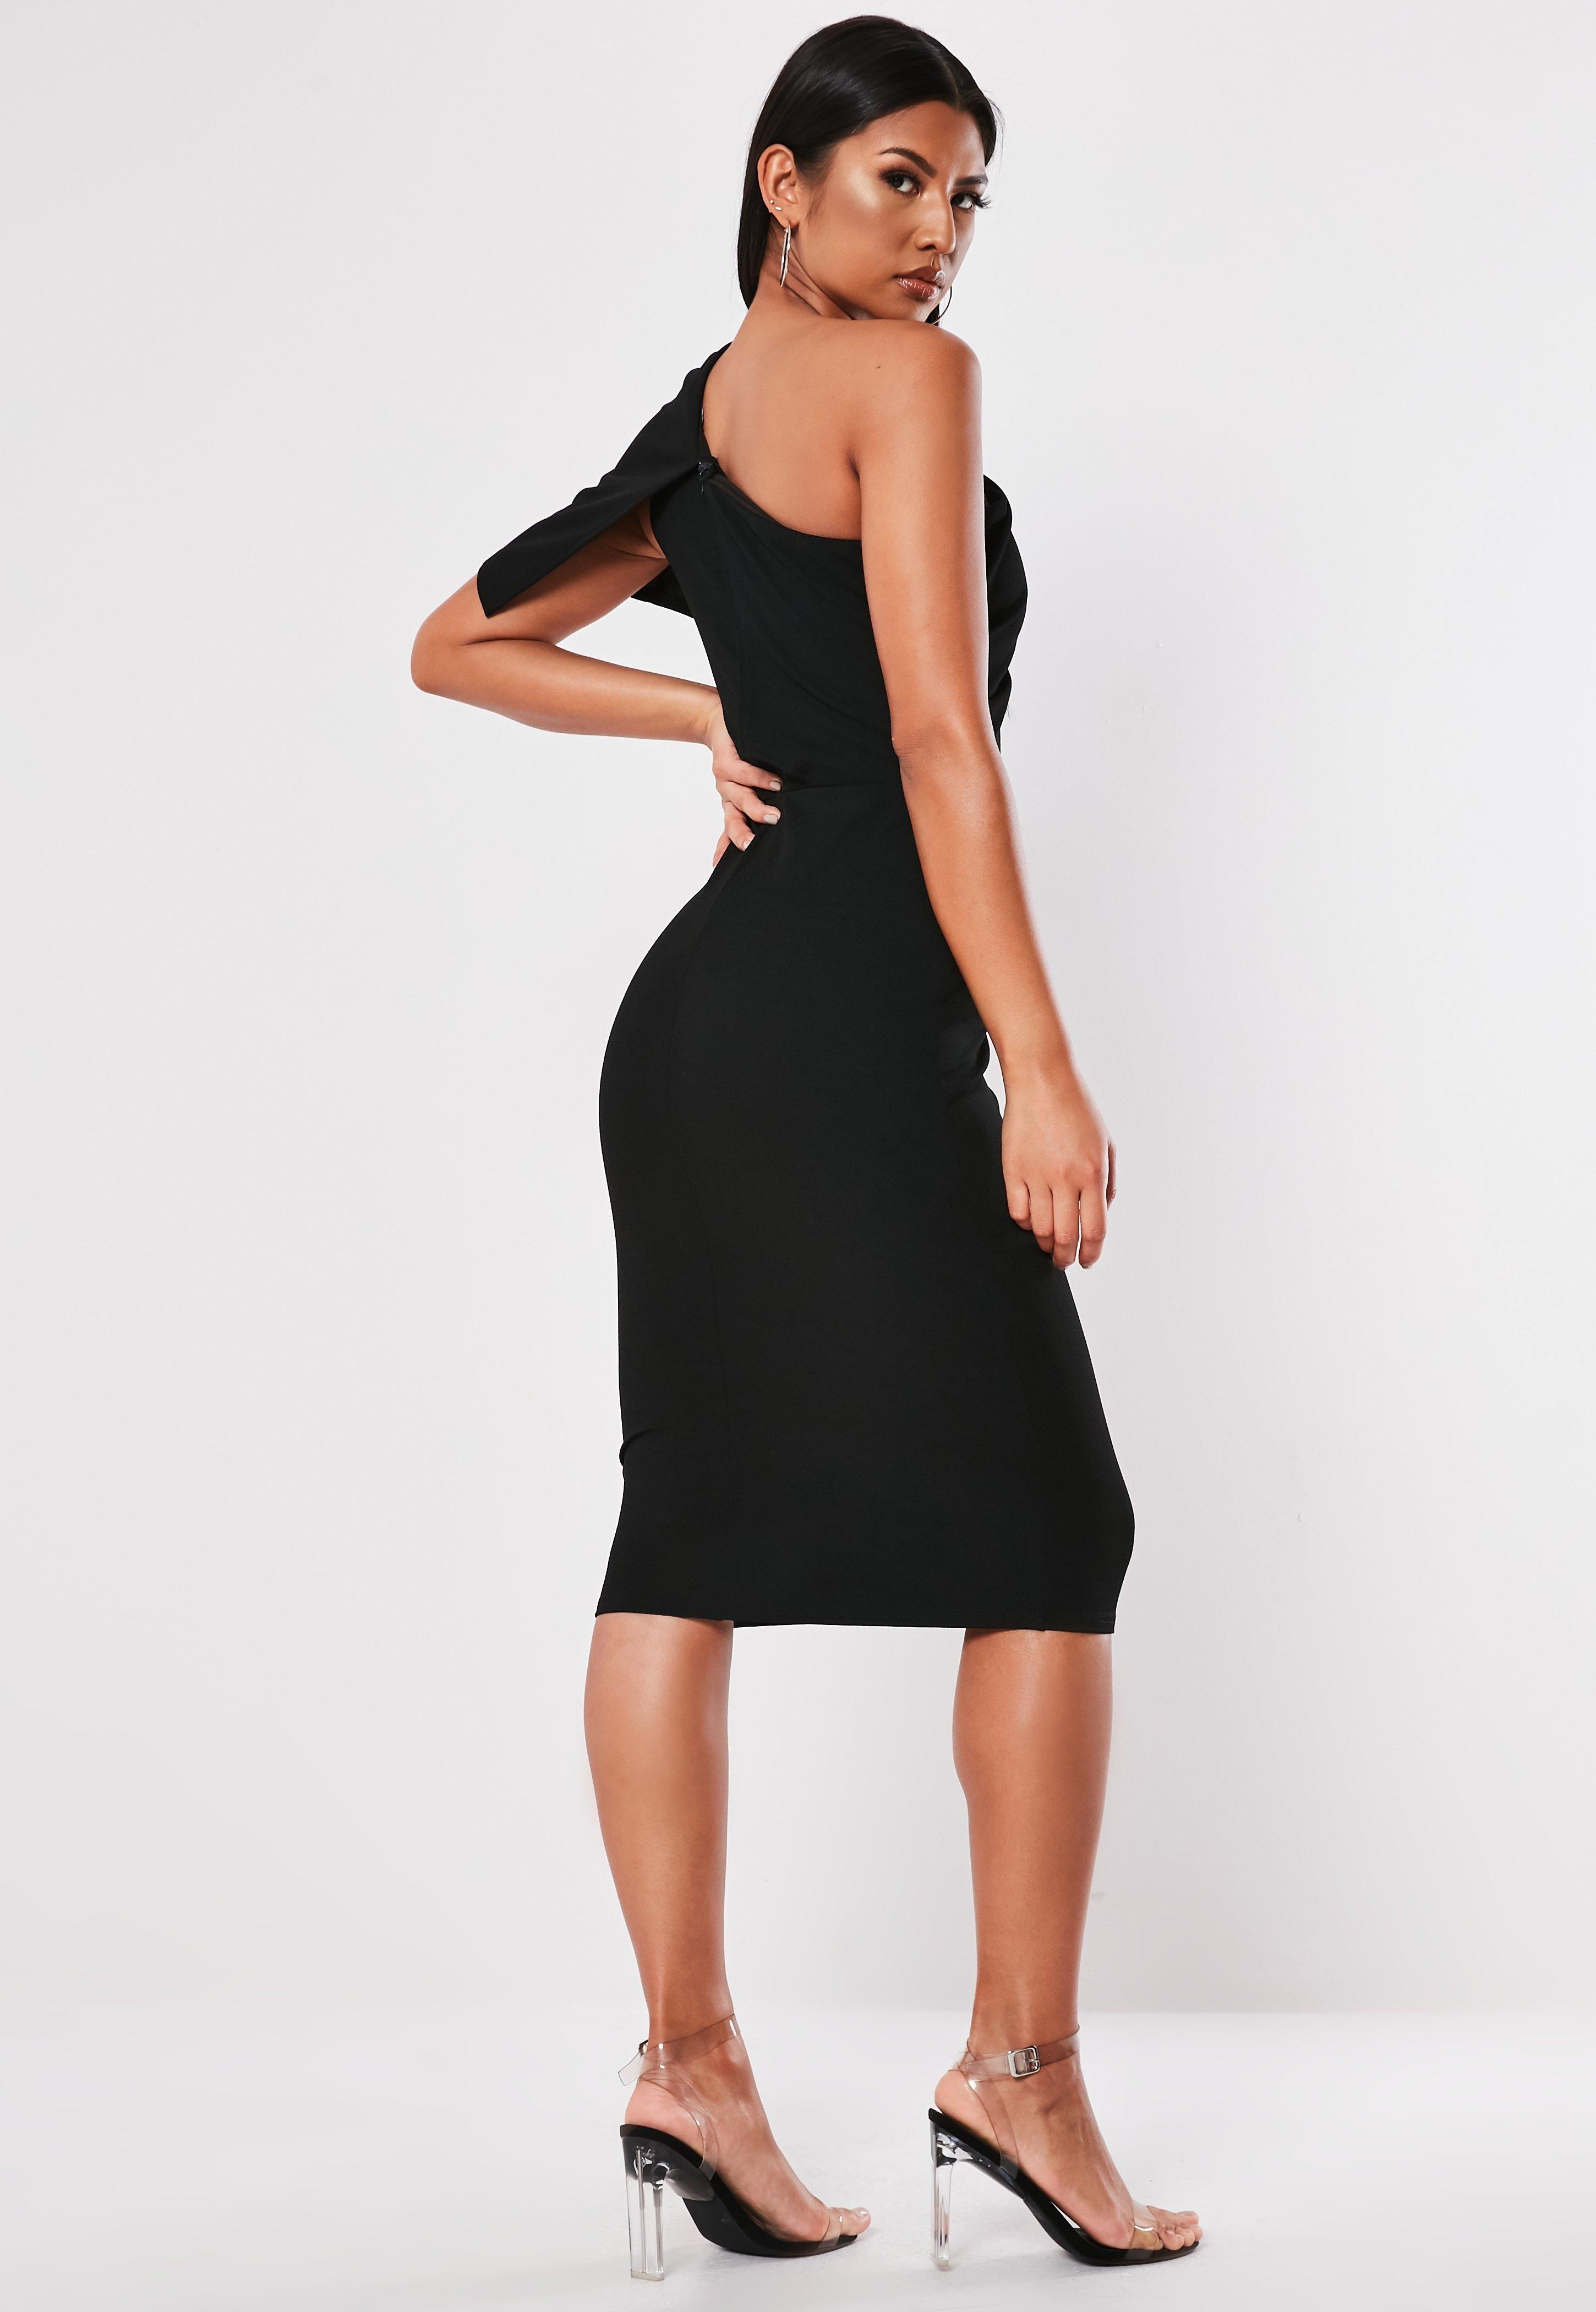 d3d103e88 Black Overlay One Shoulder Bodycon Midi Dress #Sponsored #Shoulder,  #affiliate, #